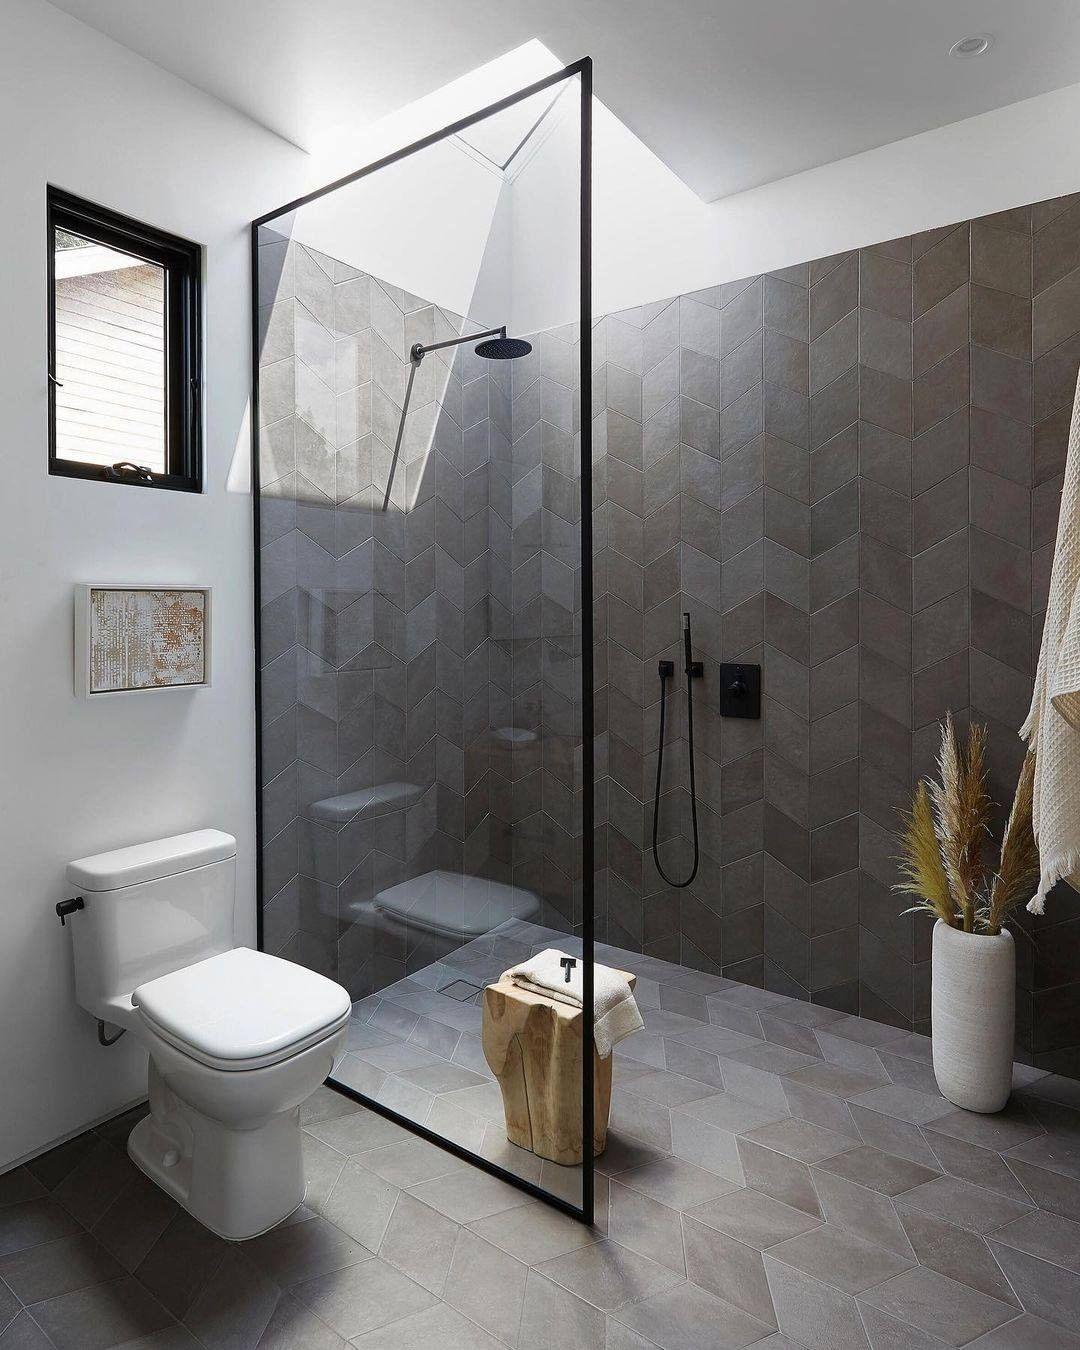 Amazing Bathroom Ideas On Instagram Amazing Bathroom Idea By Thedelvegroup Doub In 2021 Bathroom Design Bathroom Design Small Beautiful Small Bathroom Designs Bathroom idea pictures pictures